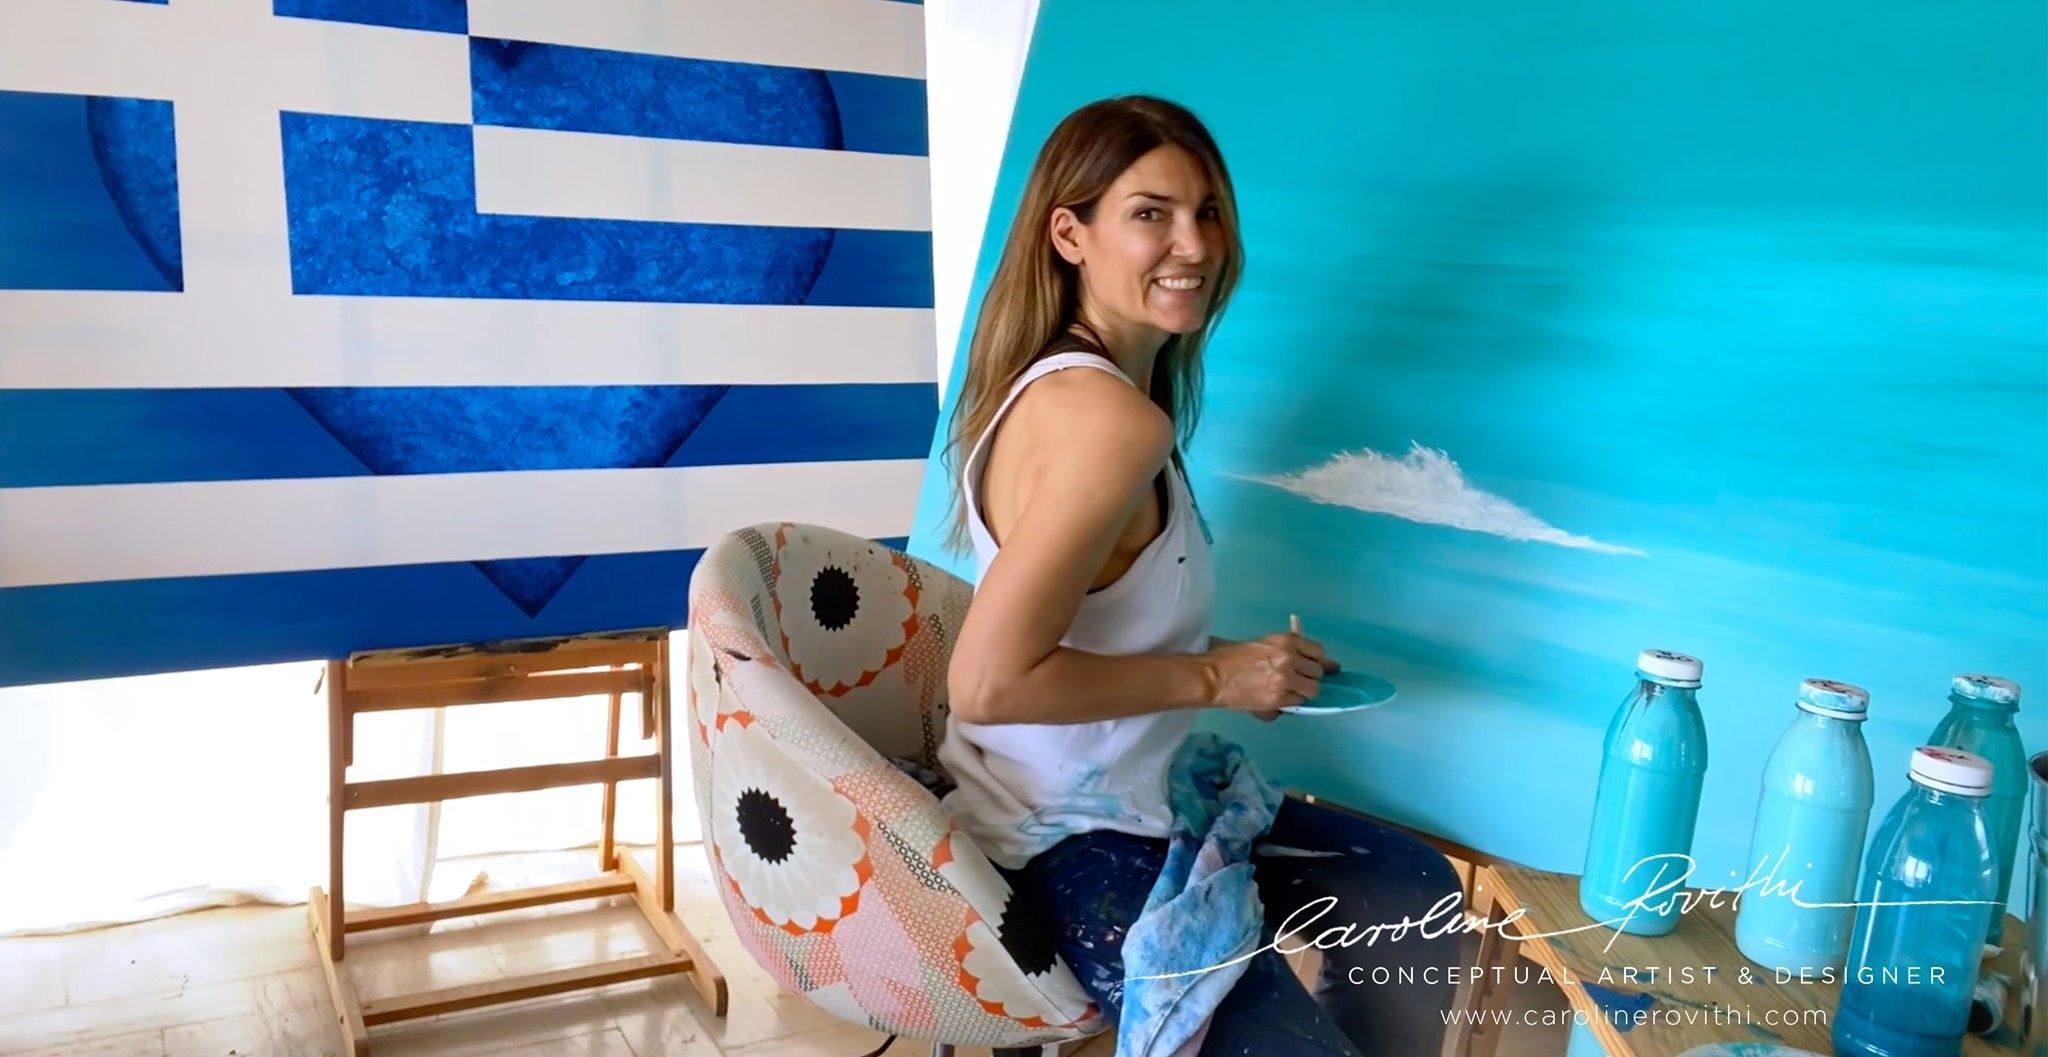 Caroline Rovithi - Conceptual Artist and Designer